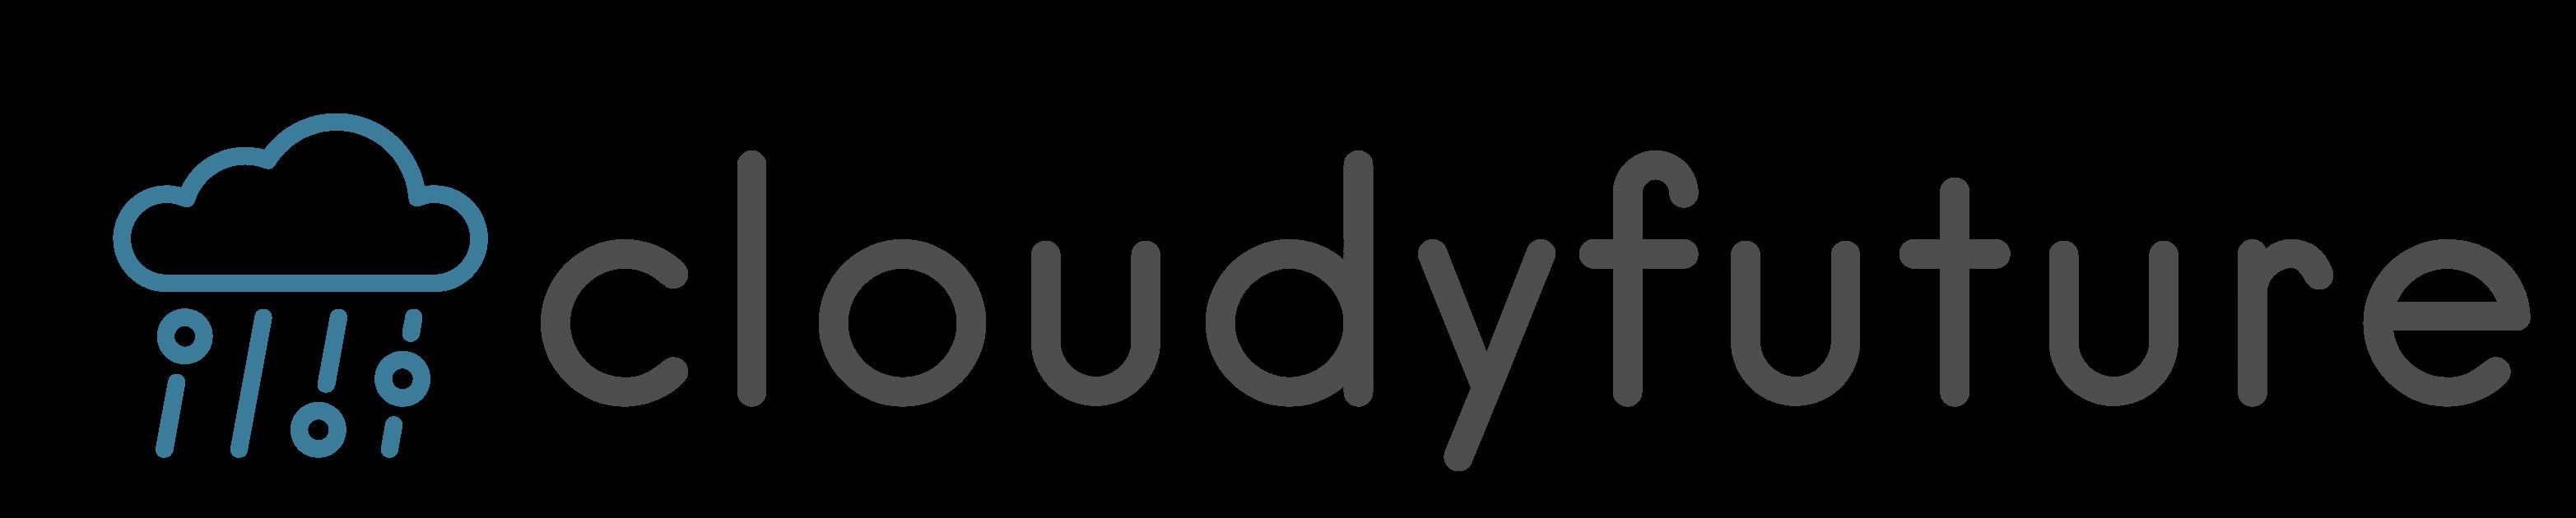 cloudyfuture LLC